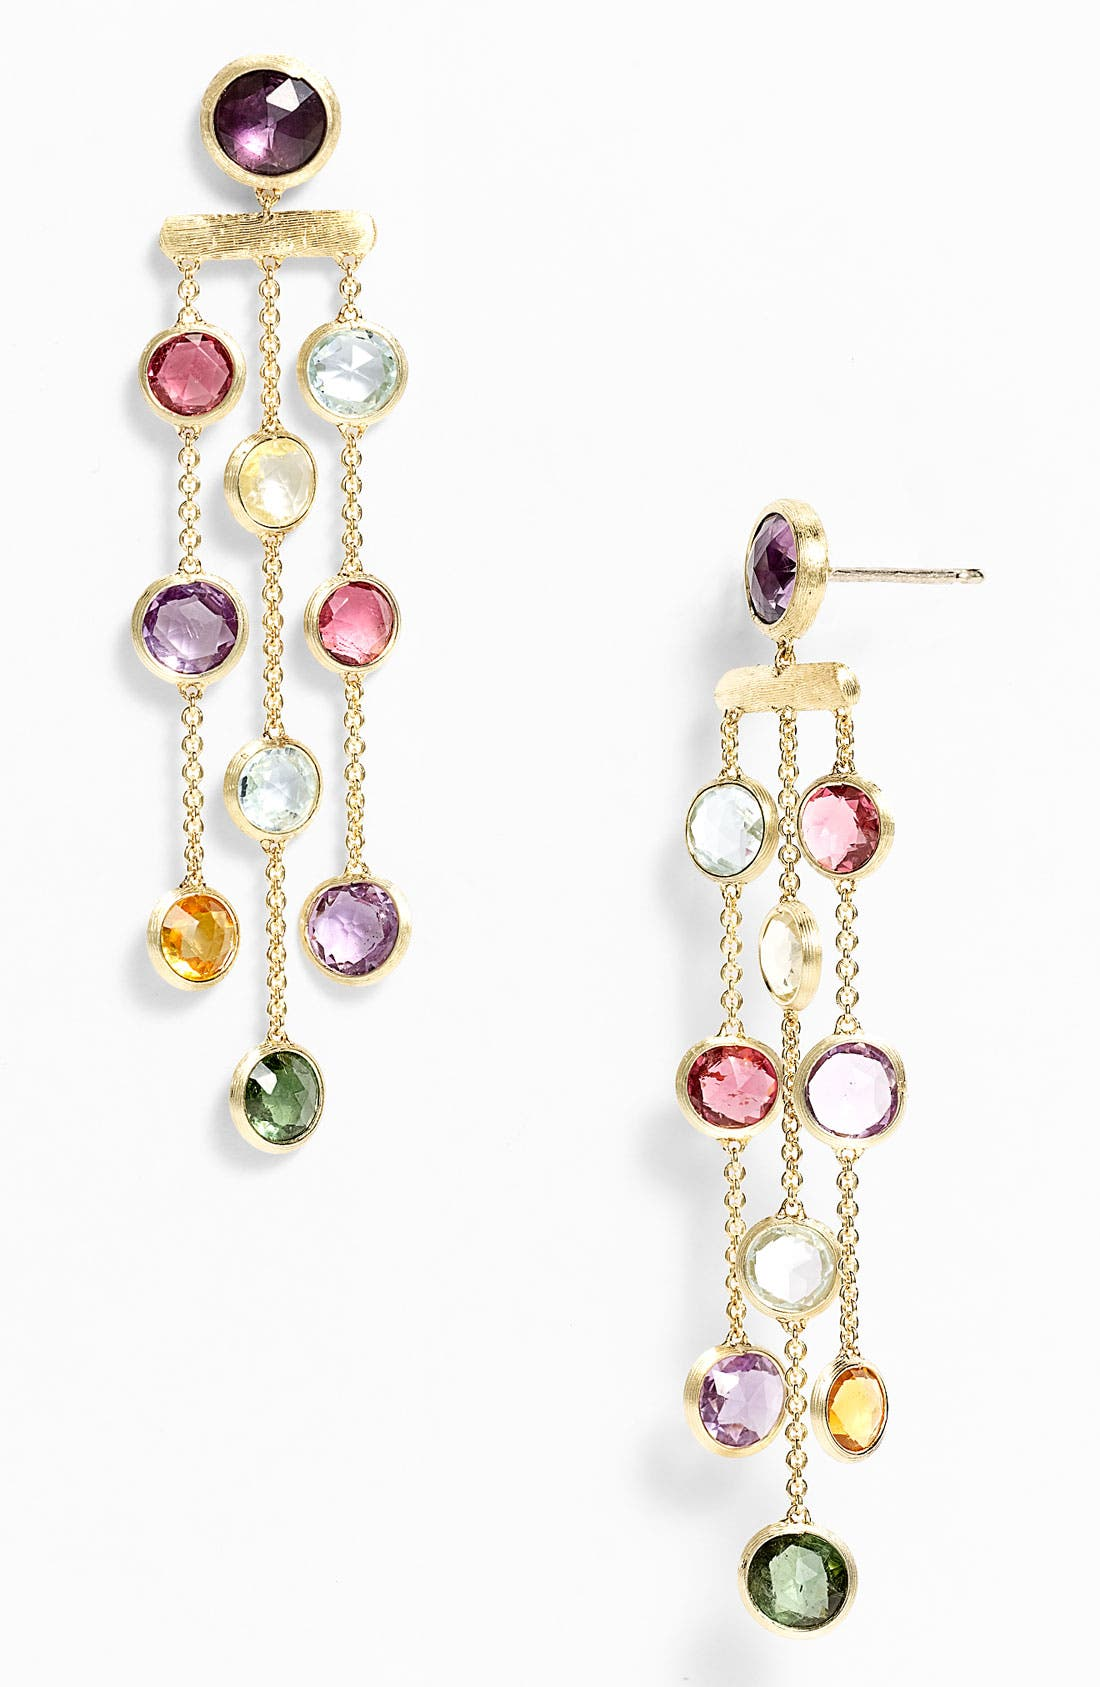 Alternate Image 1 Selected - Marco Bicego 'Mini Jaipur' Triple Strand Chandelier Earrings